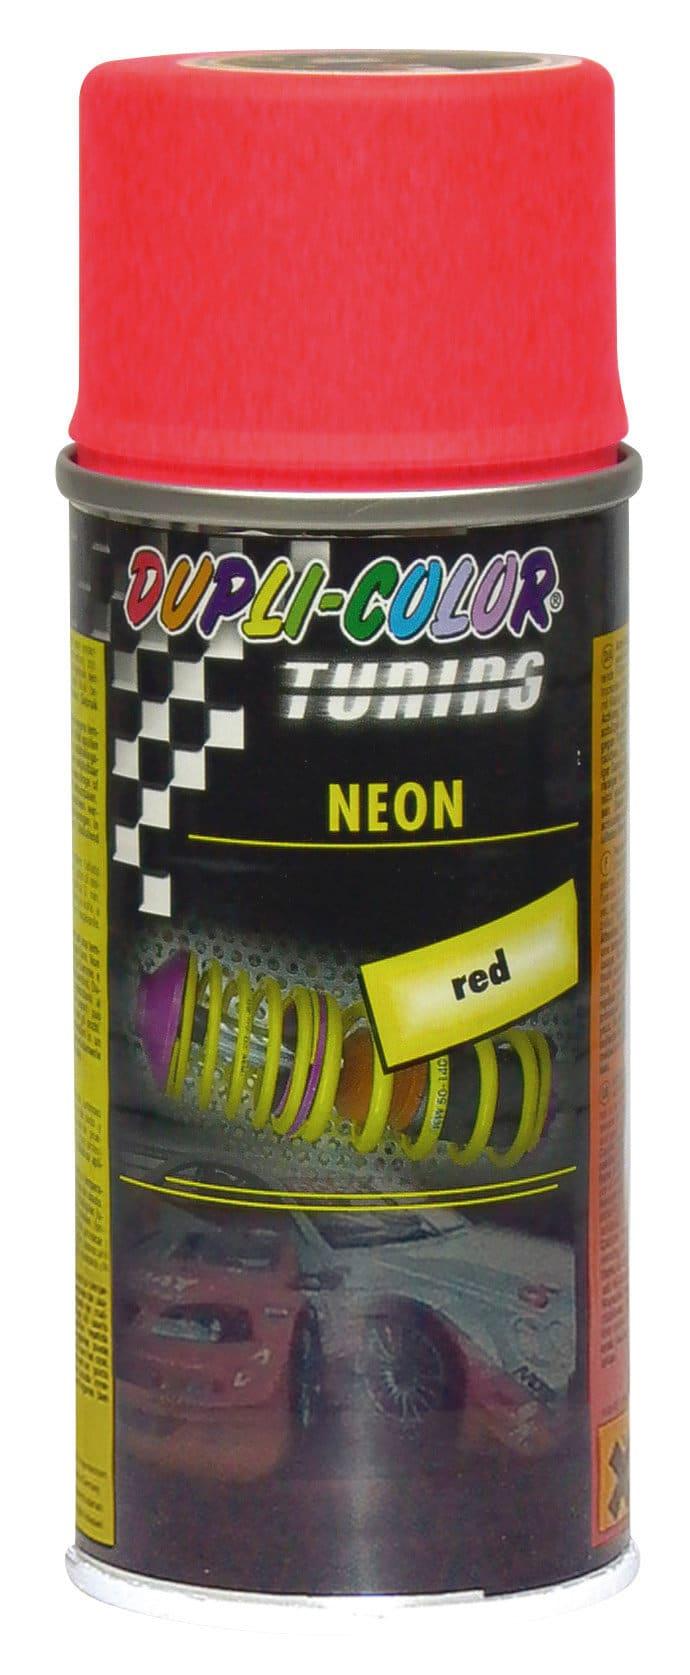 Dupli-Color Neonspray rouge 150 ml Peinture aérosol | Migros Migipedia